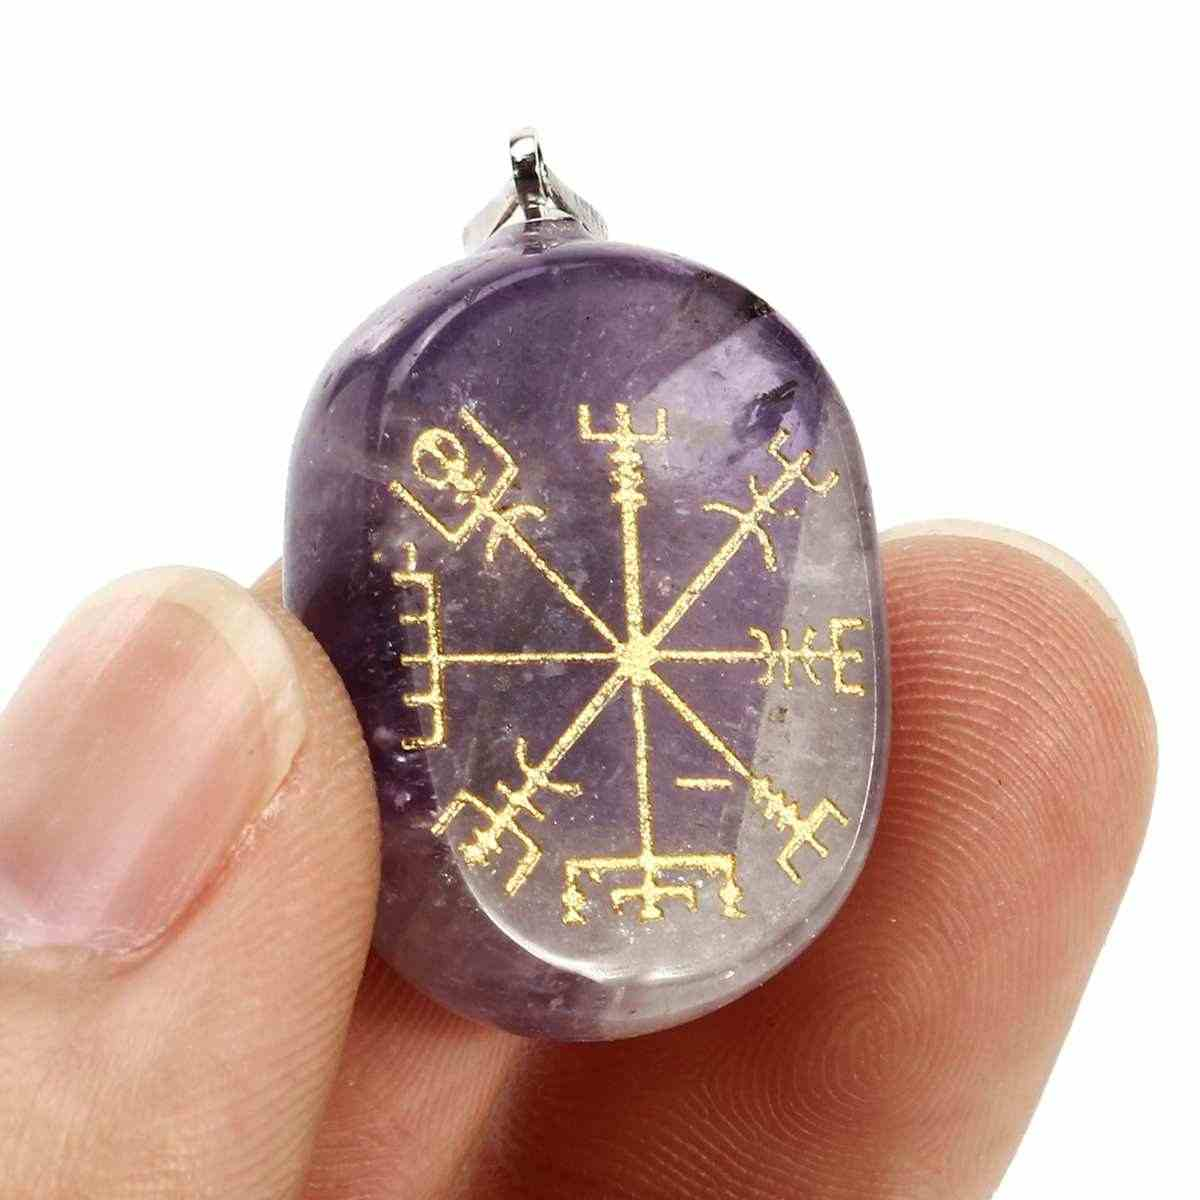 1pcs קריסטל צ 'אקרה אבנים מגולף רייקי ריפוי חקוק s סמל תליון סגלגל עגול תכשיטי קולר בית תפאורה עם חור